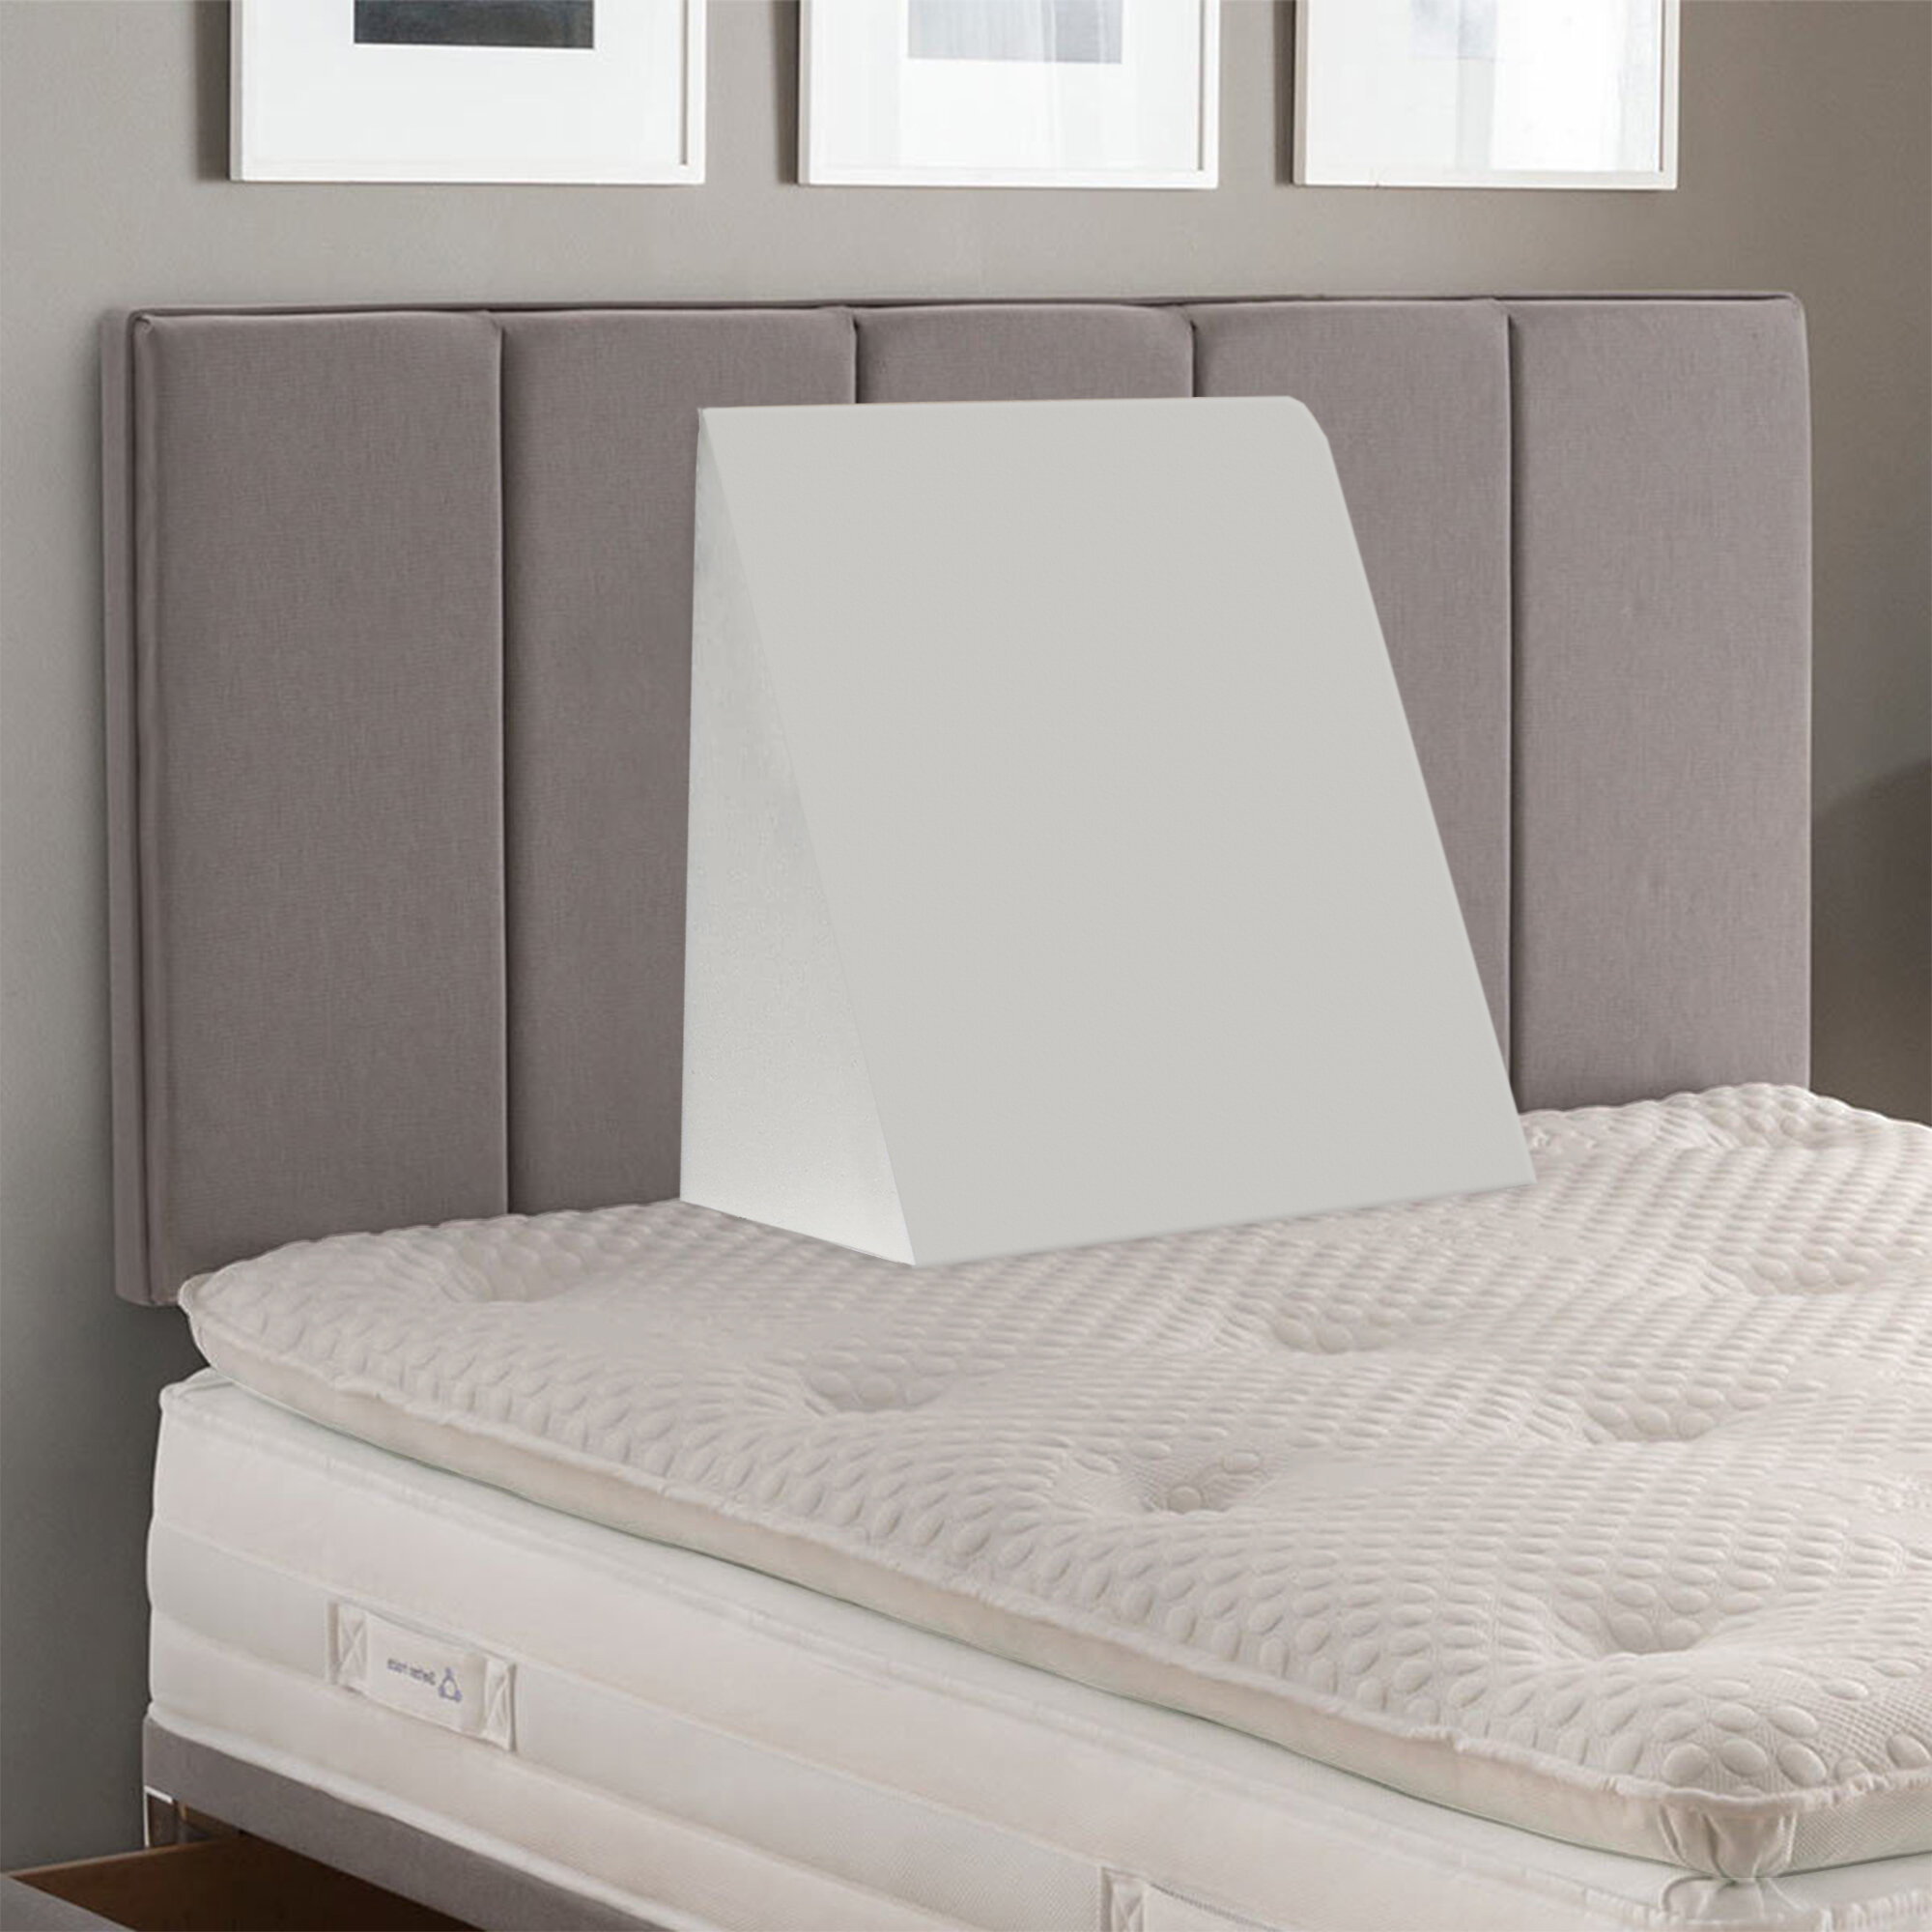 Wedge Pillow Bed Pillows You Ll Love In 2021 Wayfair